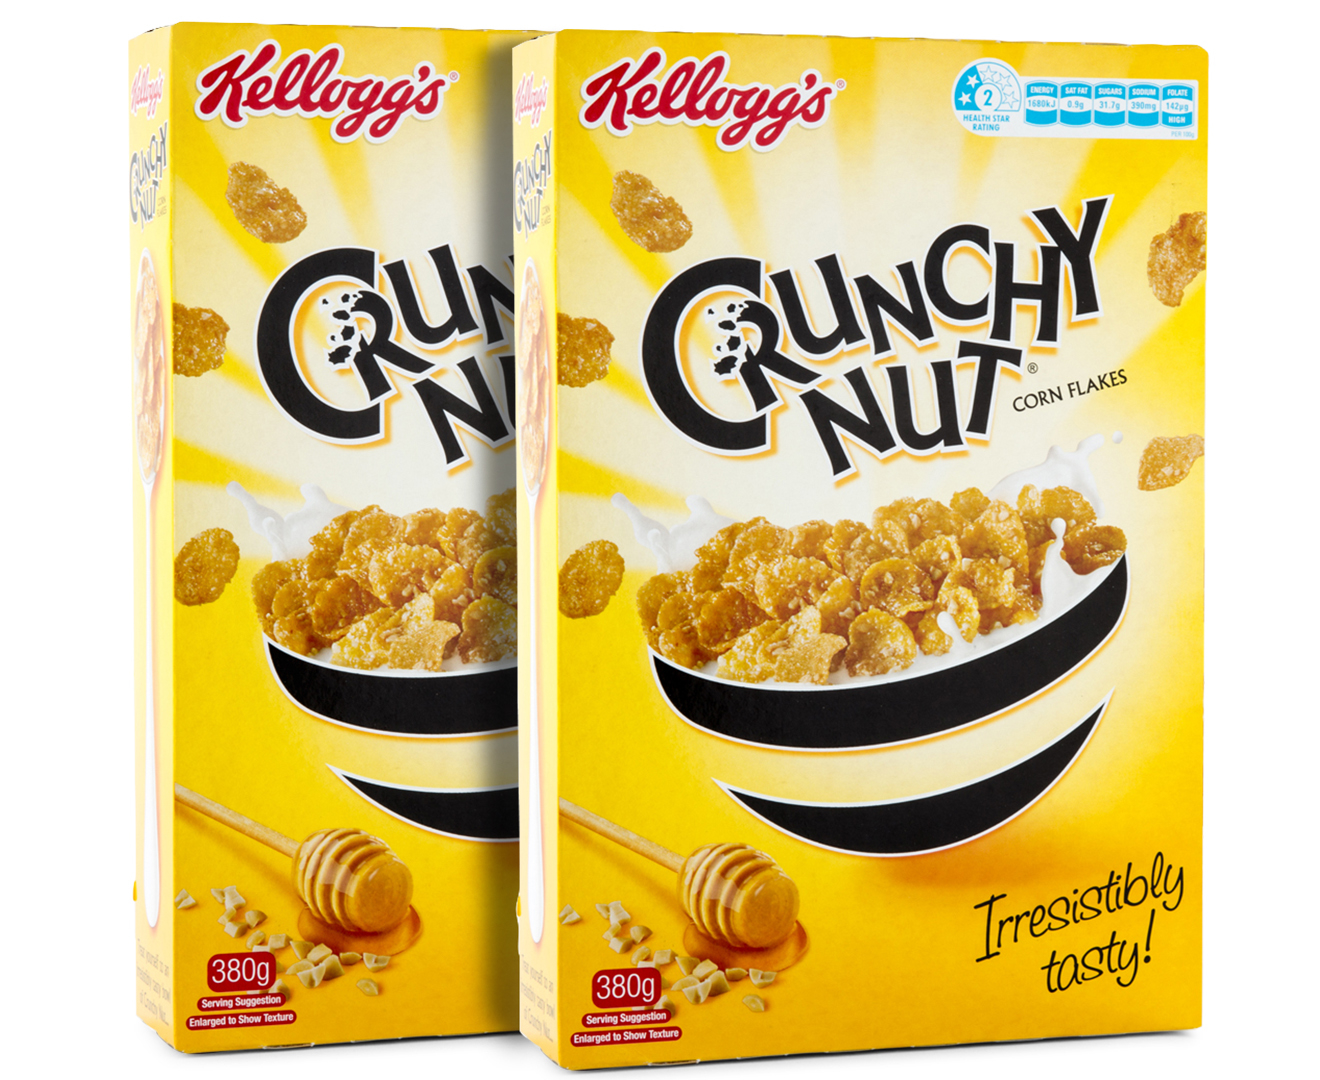 2 X Kelloggs Crunchy Nut Corn Flakes 380g Ebay Deal